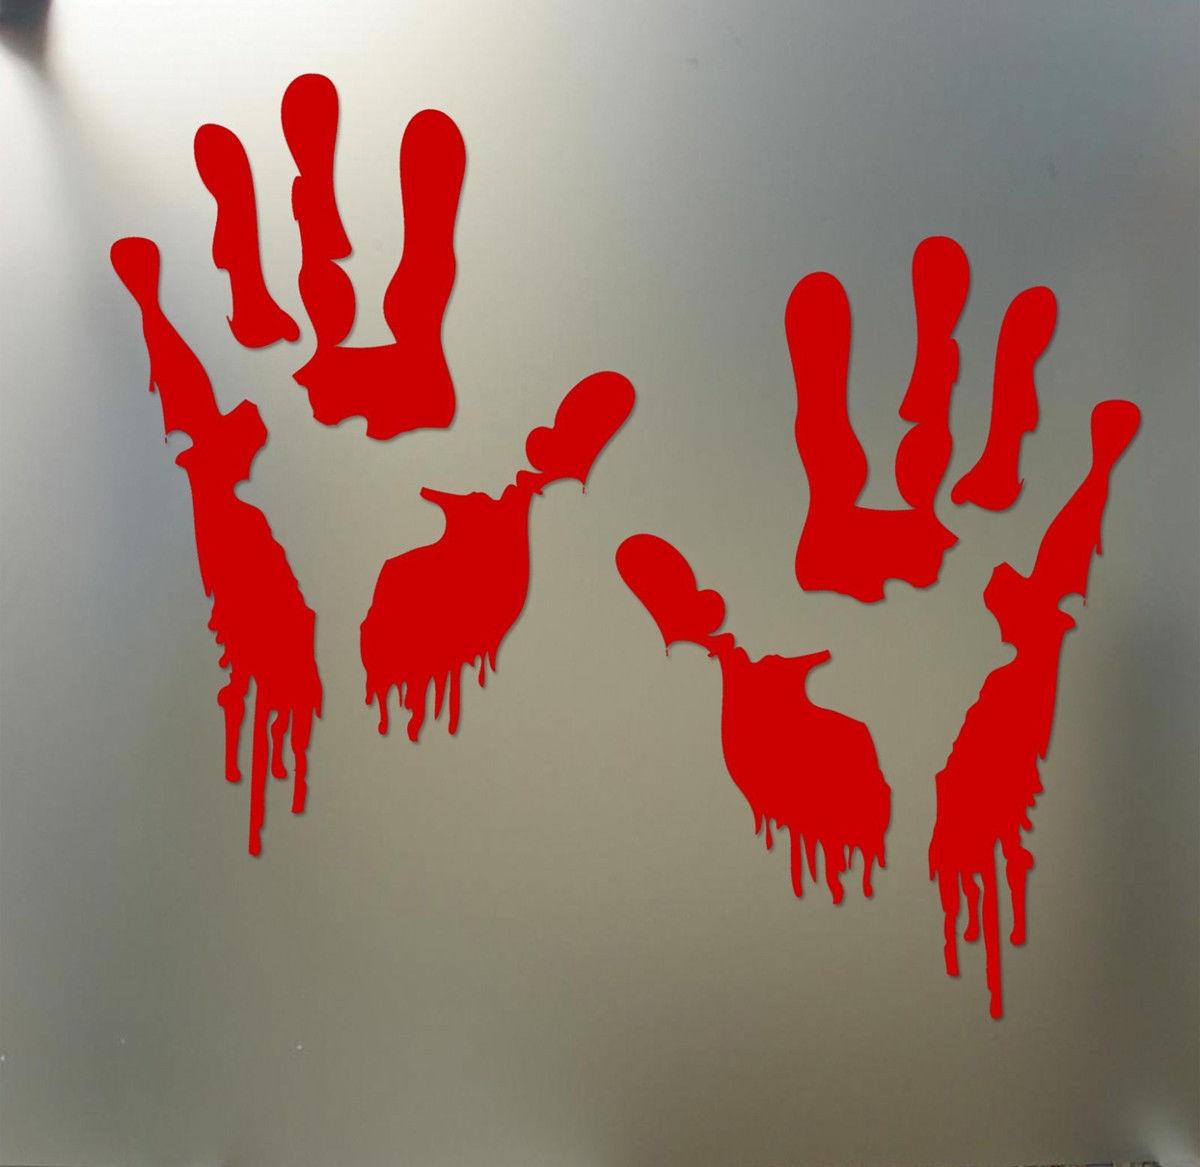 BLEEDING HAND HALLOWEEN Vinyl Decal Car Sticker Wall CHOOSE SIZE COLOR